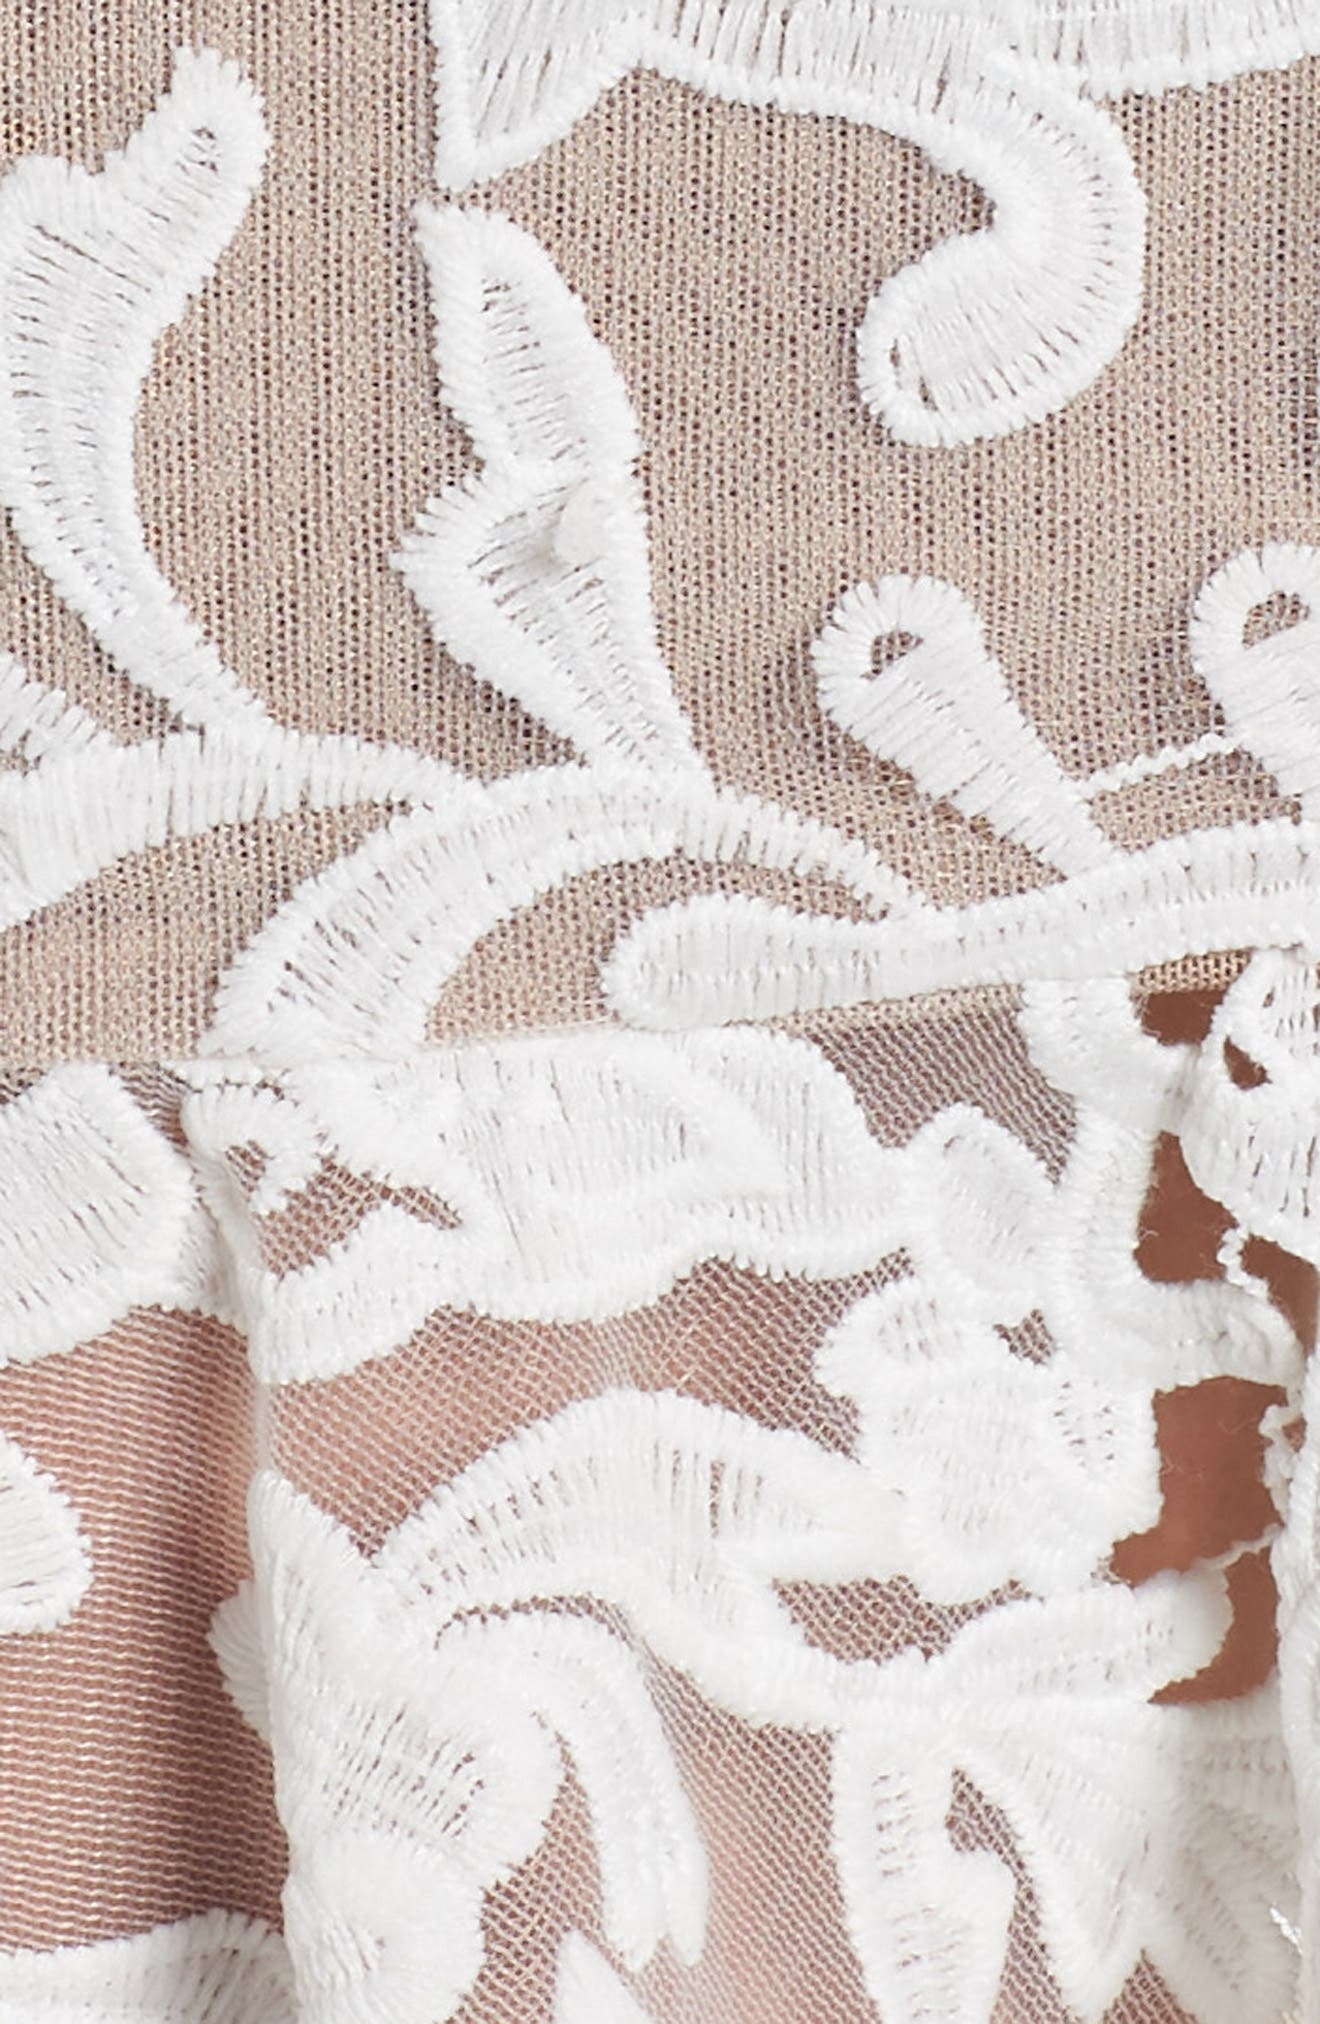 Rocha Waterfall Ruffle Lace Midi Dress,                             Alternate thumbnail 5, color,                             900